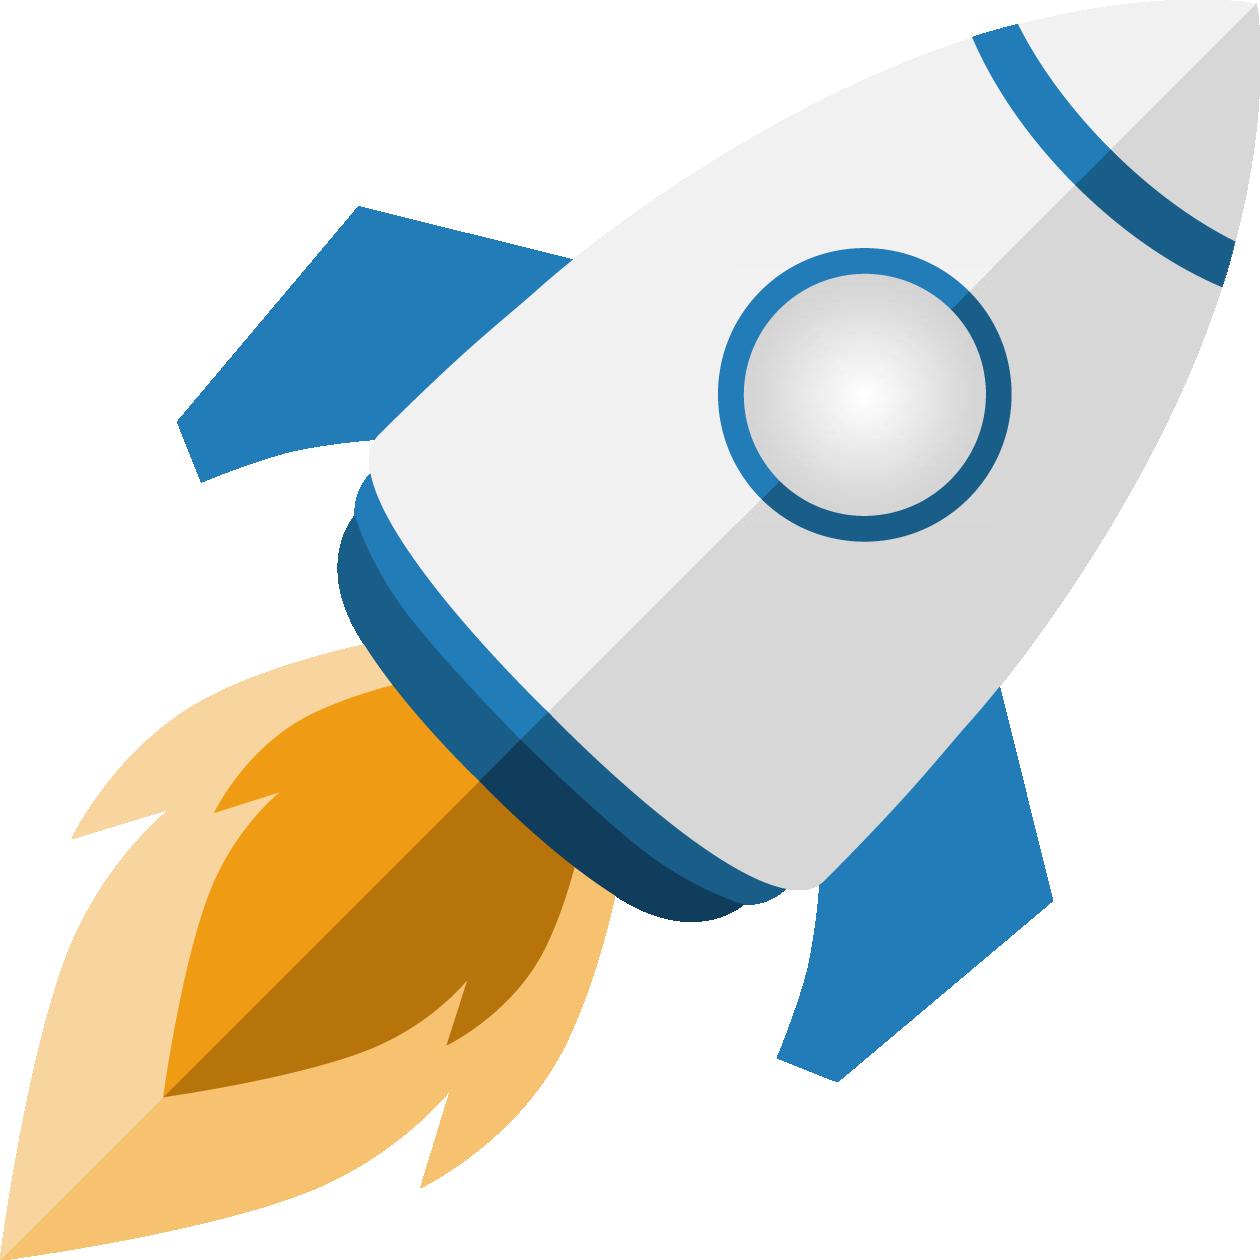 Stellar Logo Stellar Logos Download Vector